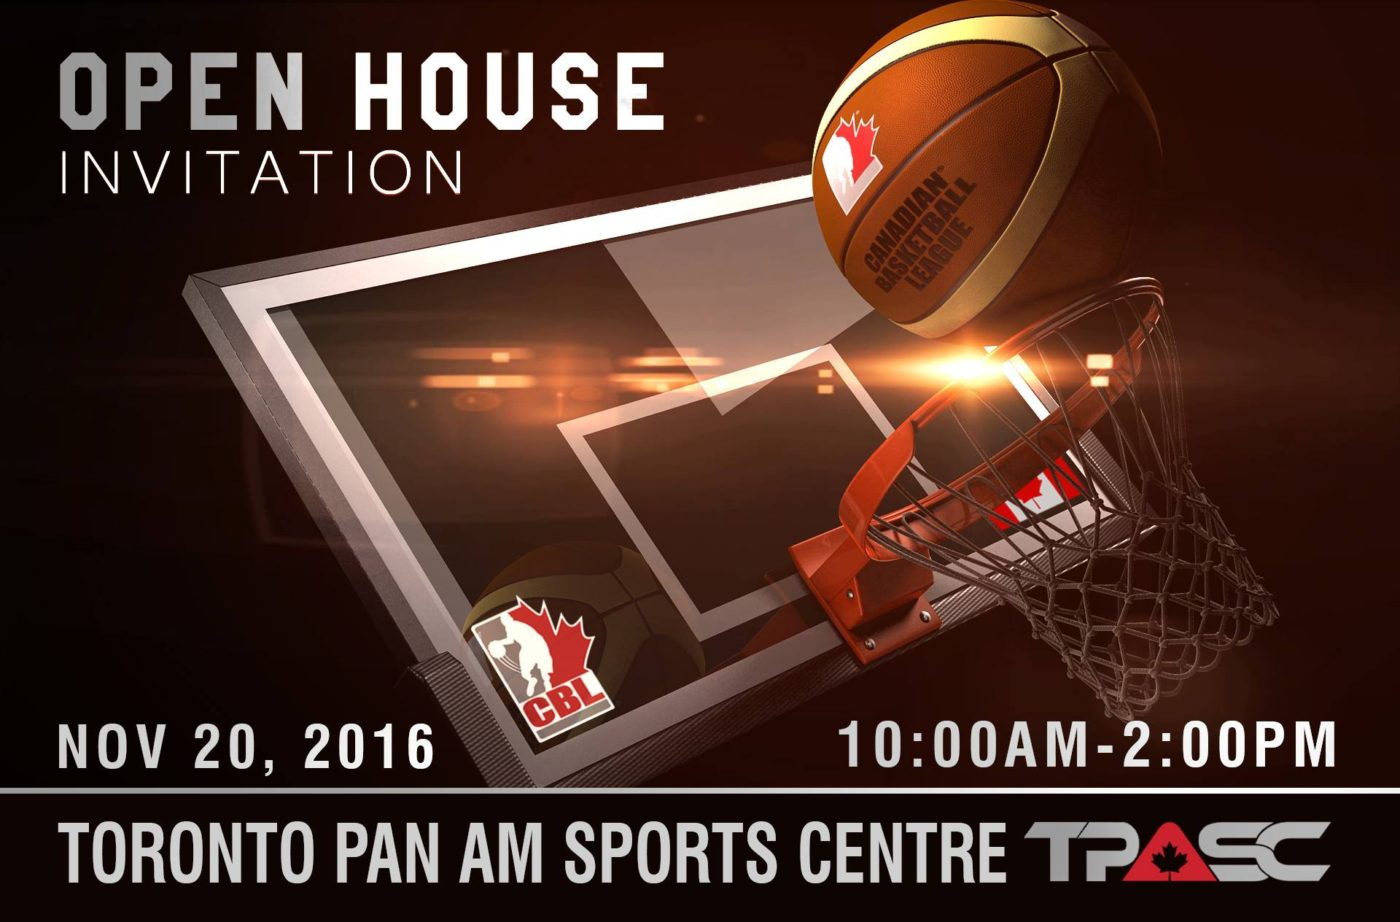 Canadian Basketball League – OPEN HOUSE EVENT Sunday Nov 20th, 2016